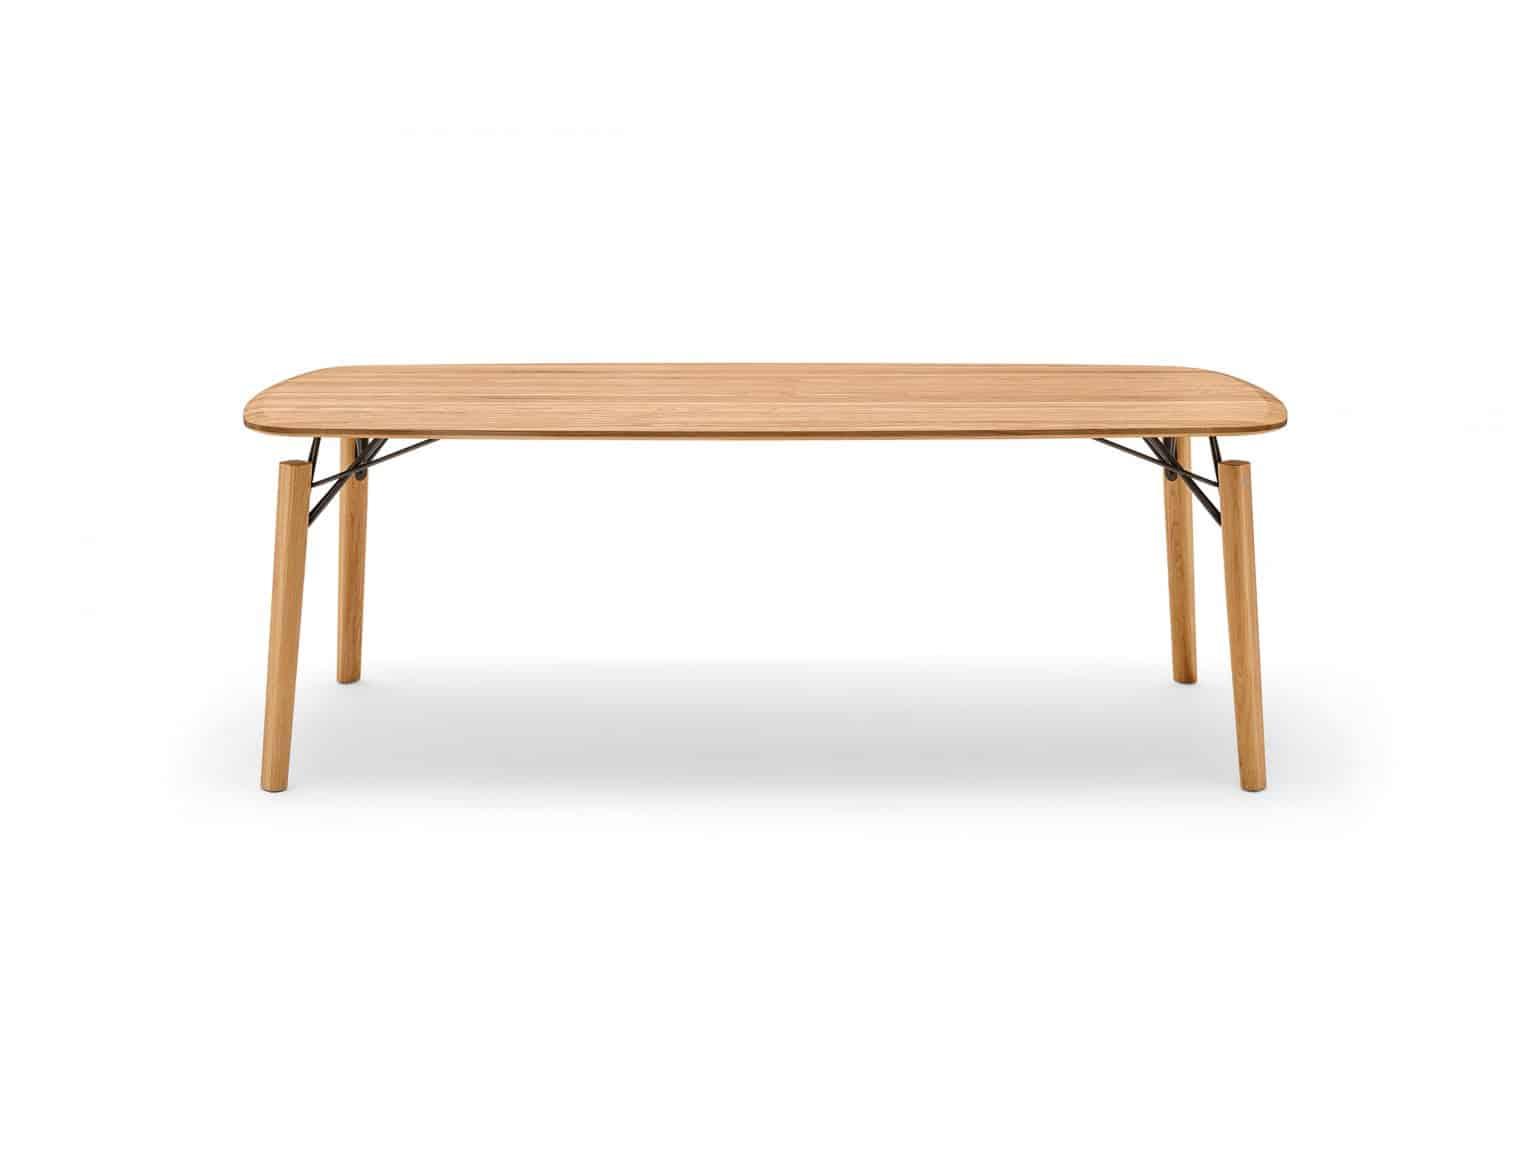 Rolf benz tafel 964 pa